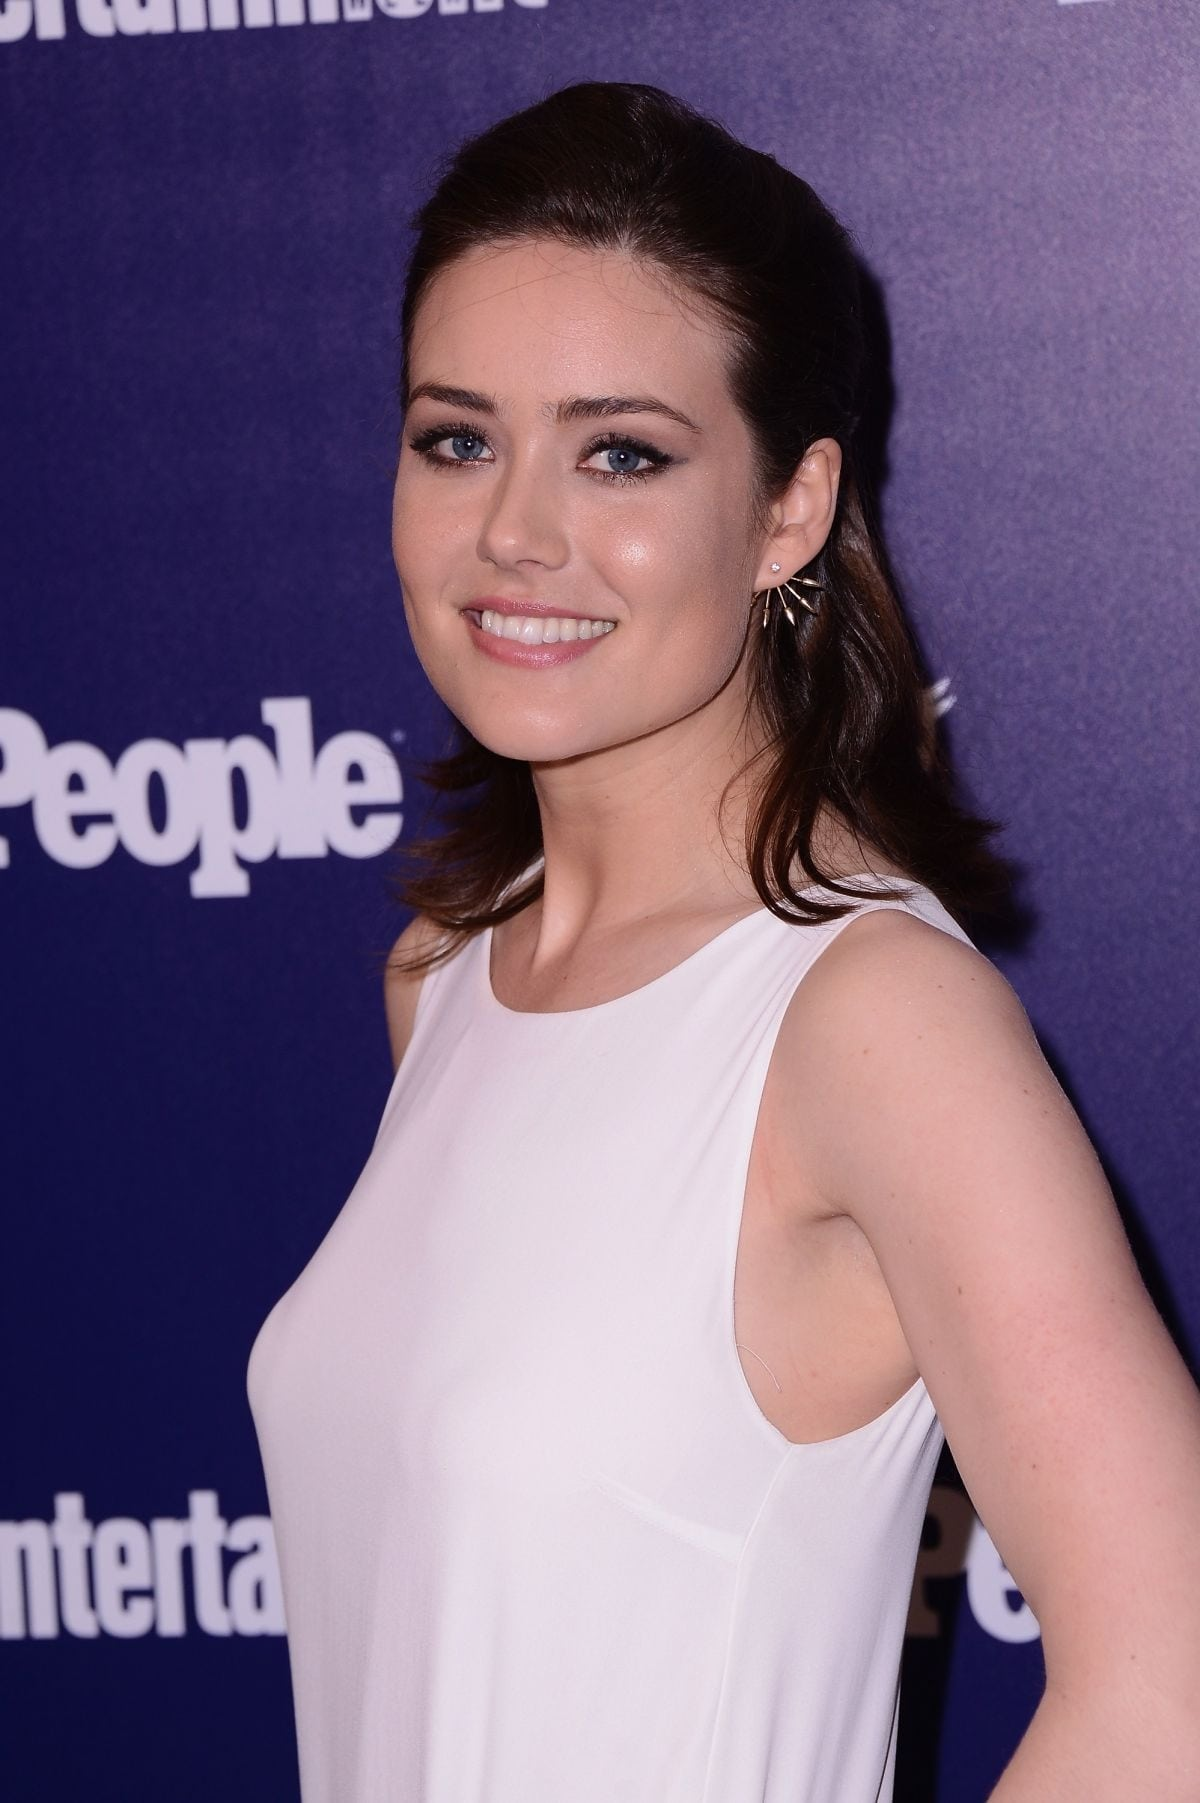 Megan Boone / Elizabeth